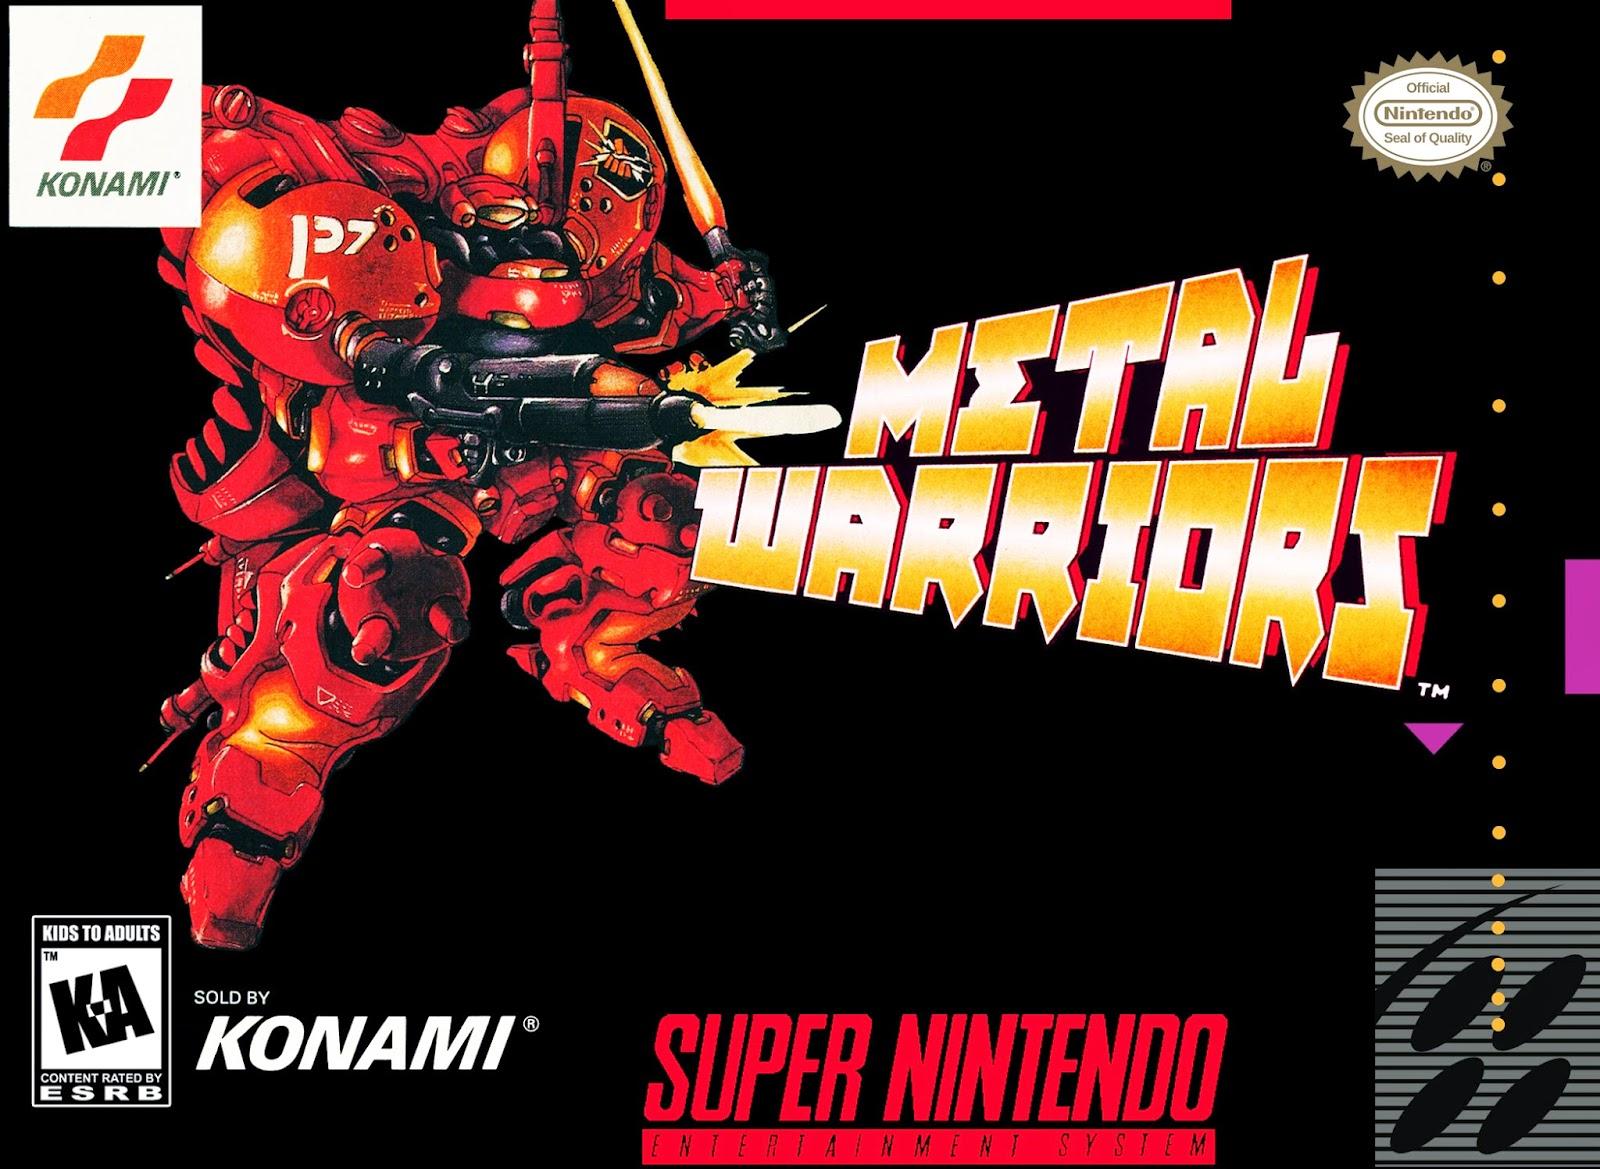 Metal Warrior+game+snes+rom+retro+covert+art